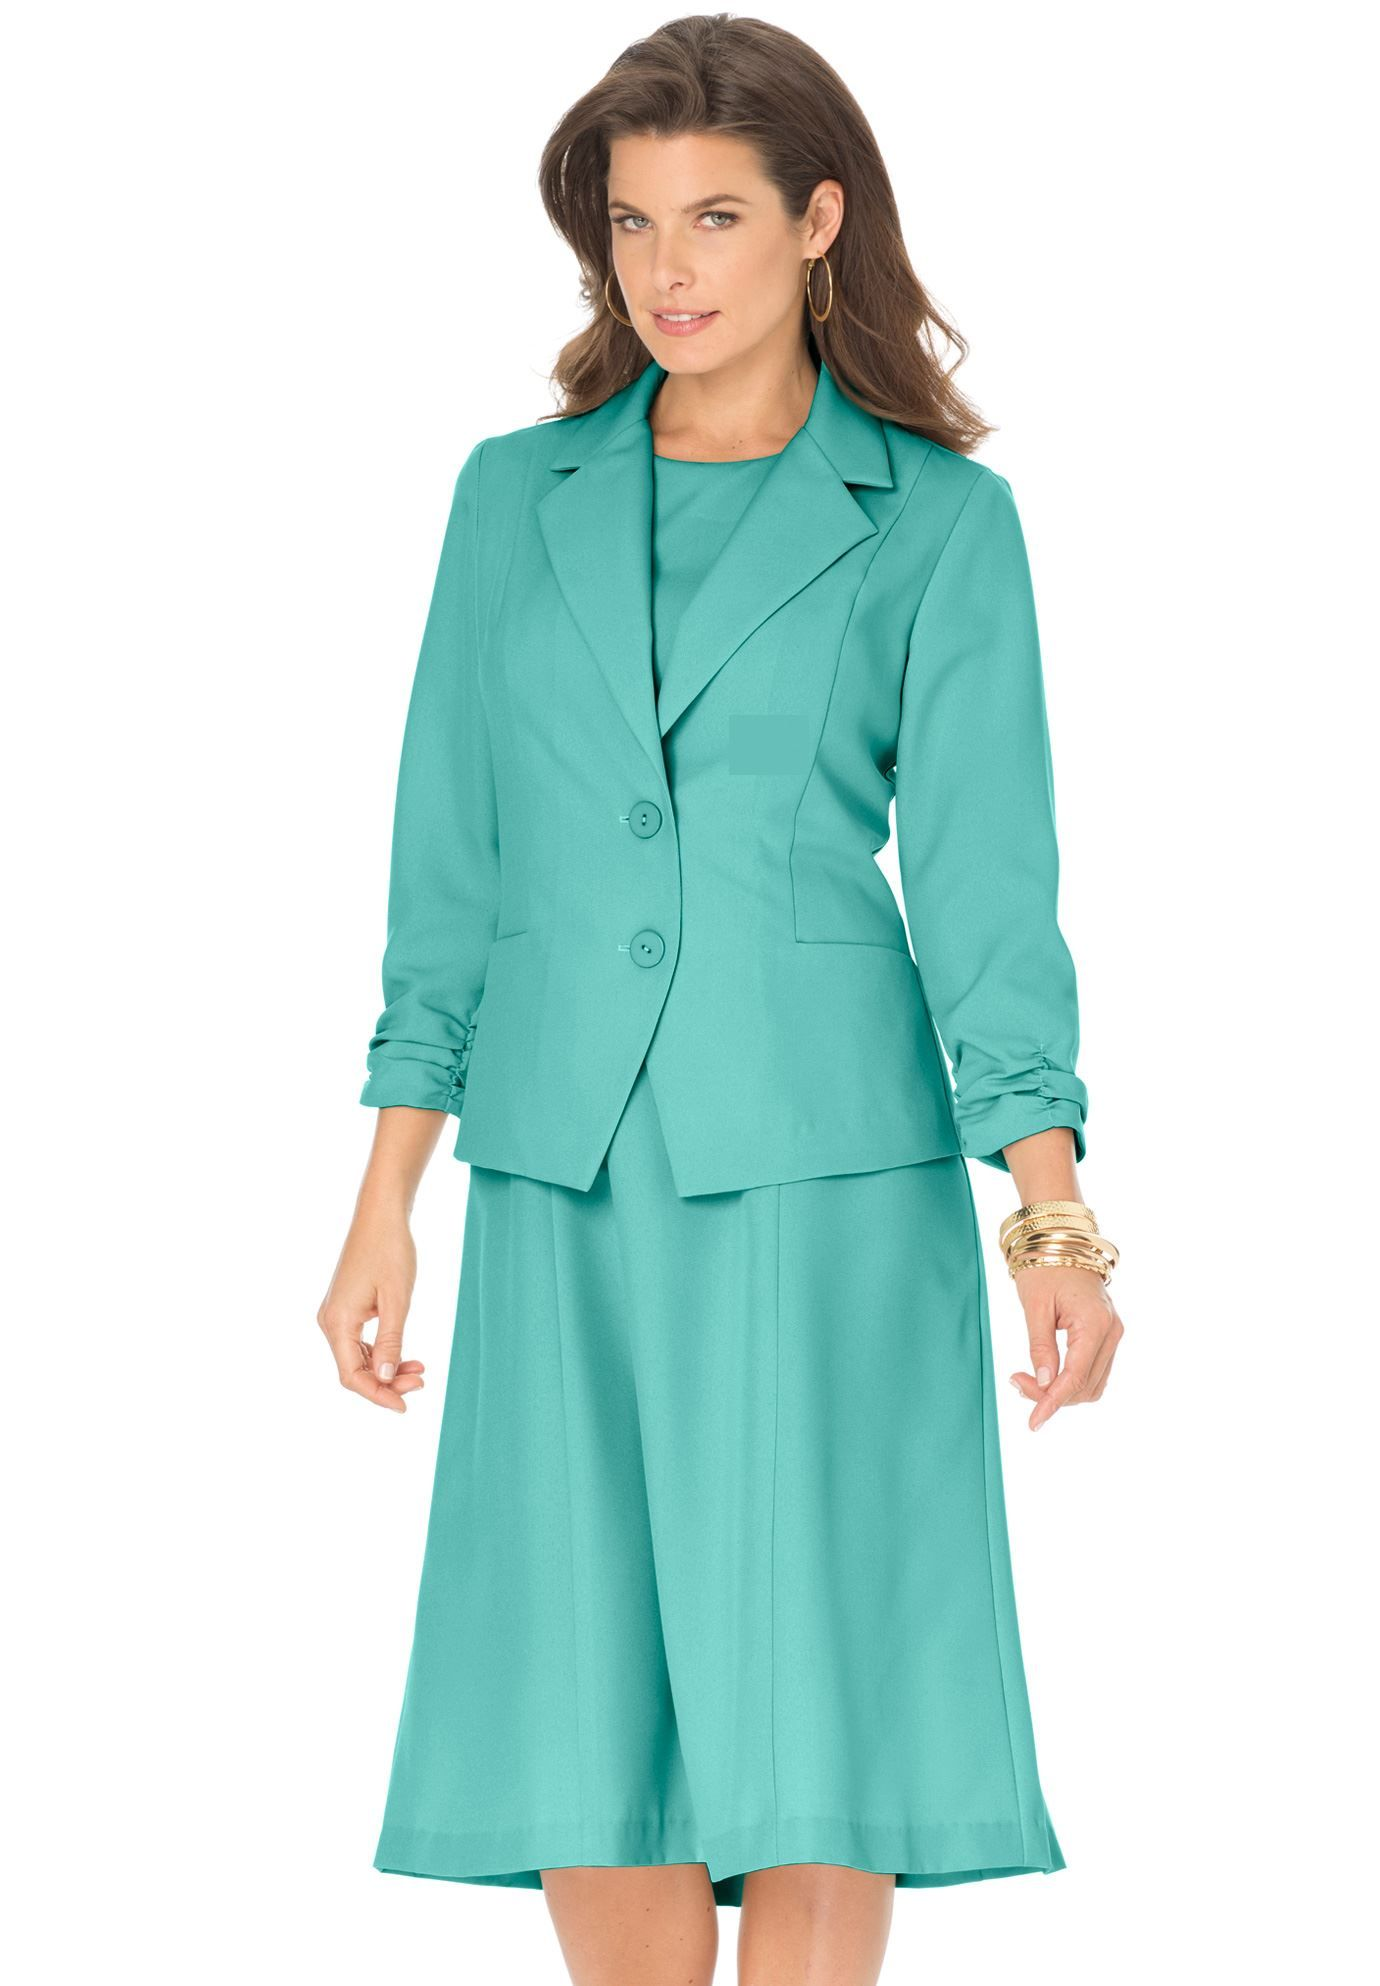 Shirred Jacket Dress | Plus Size Suits | fullbeauty